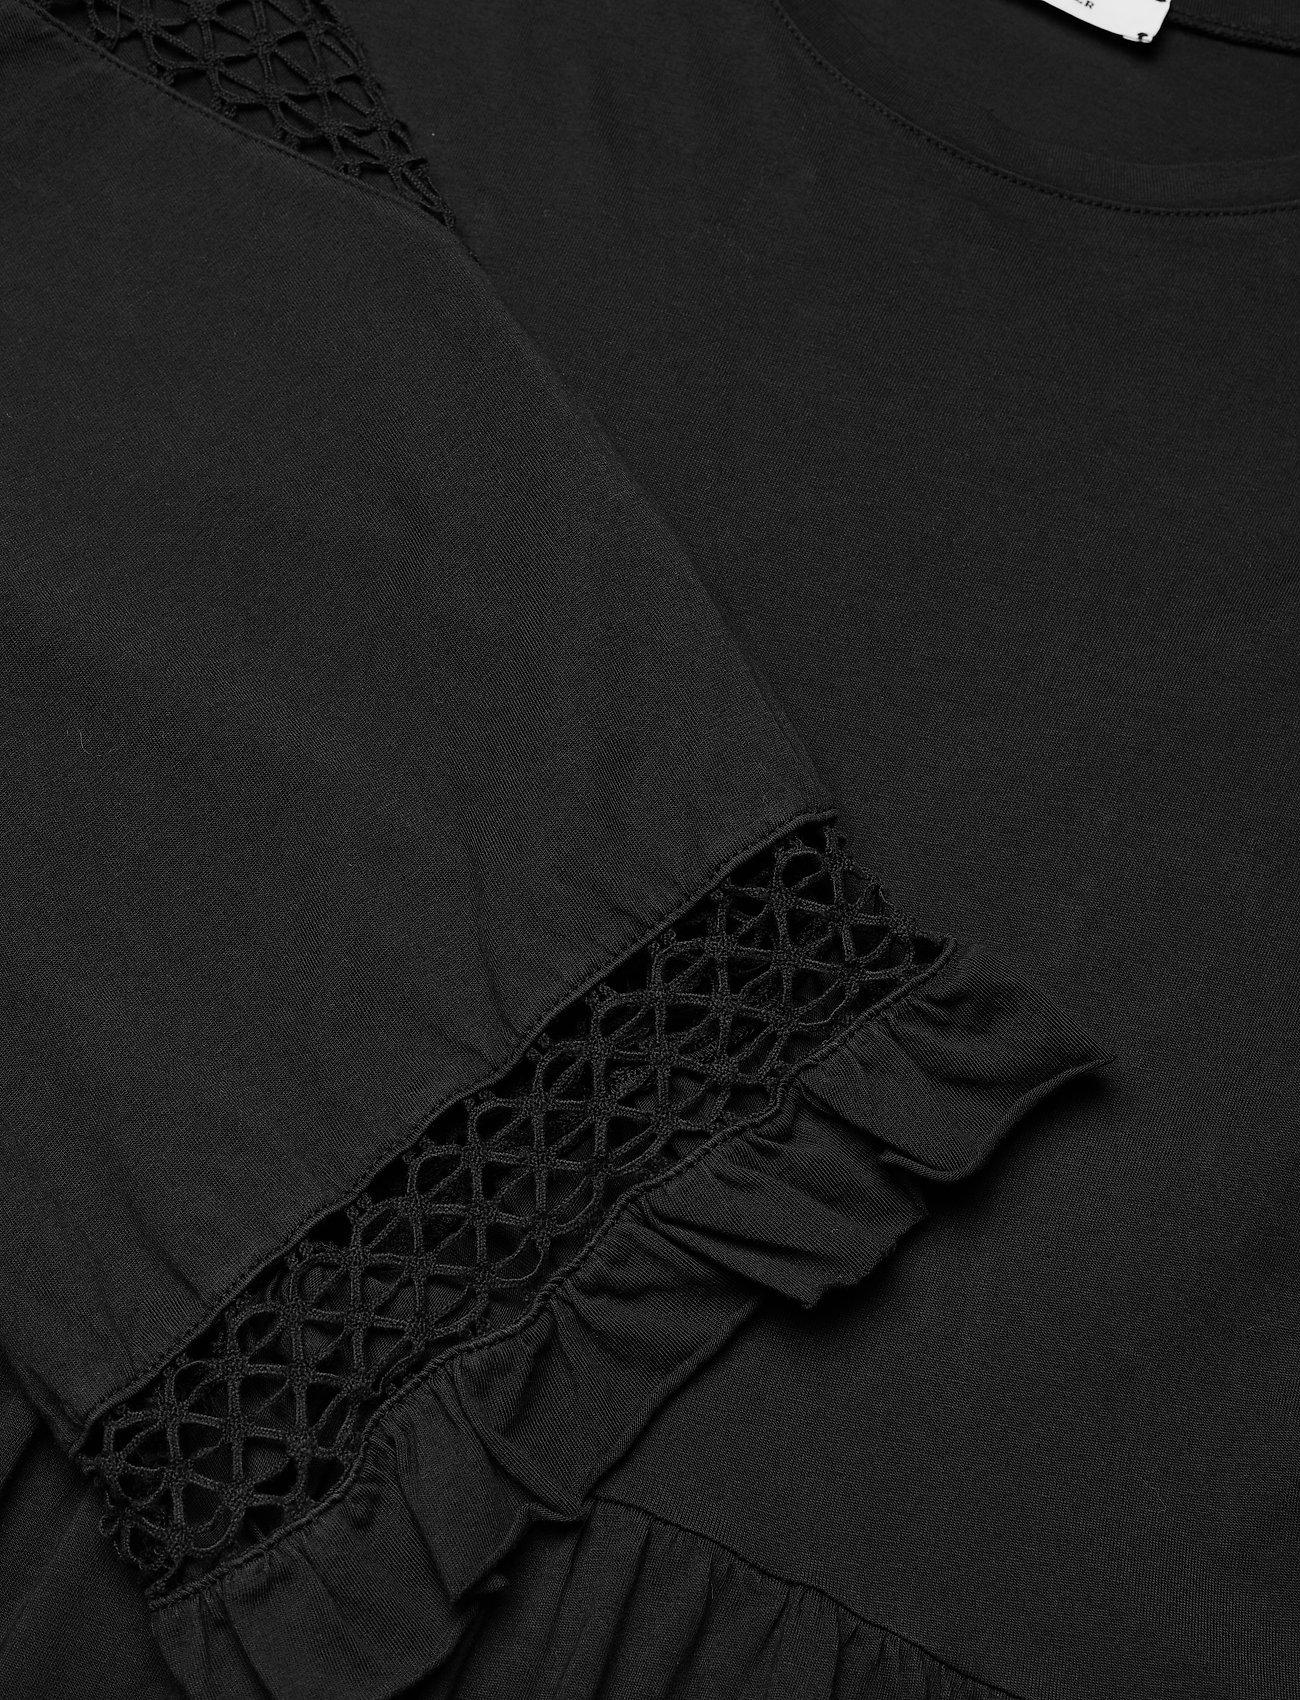 Dorothee Schumacher - CASUAL STATEMENT dress 3/4 sleeve - maxi dresses - pure black - 2